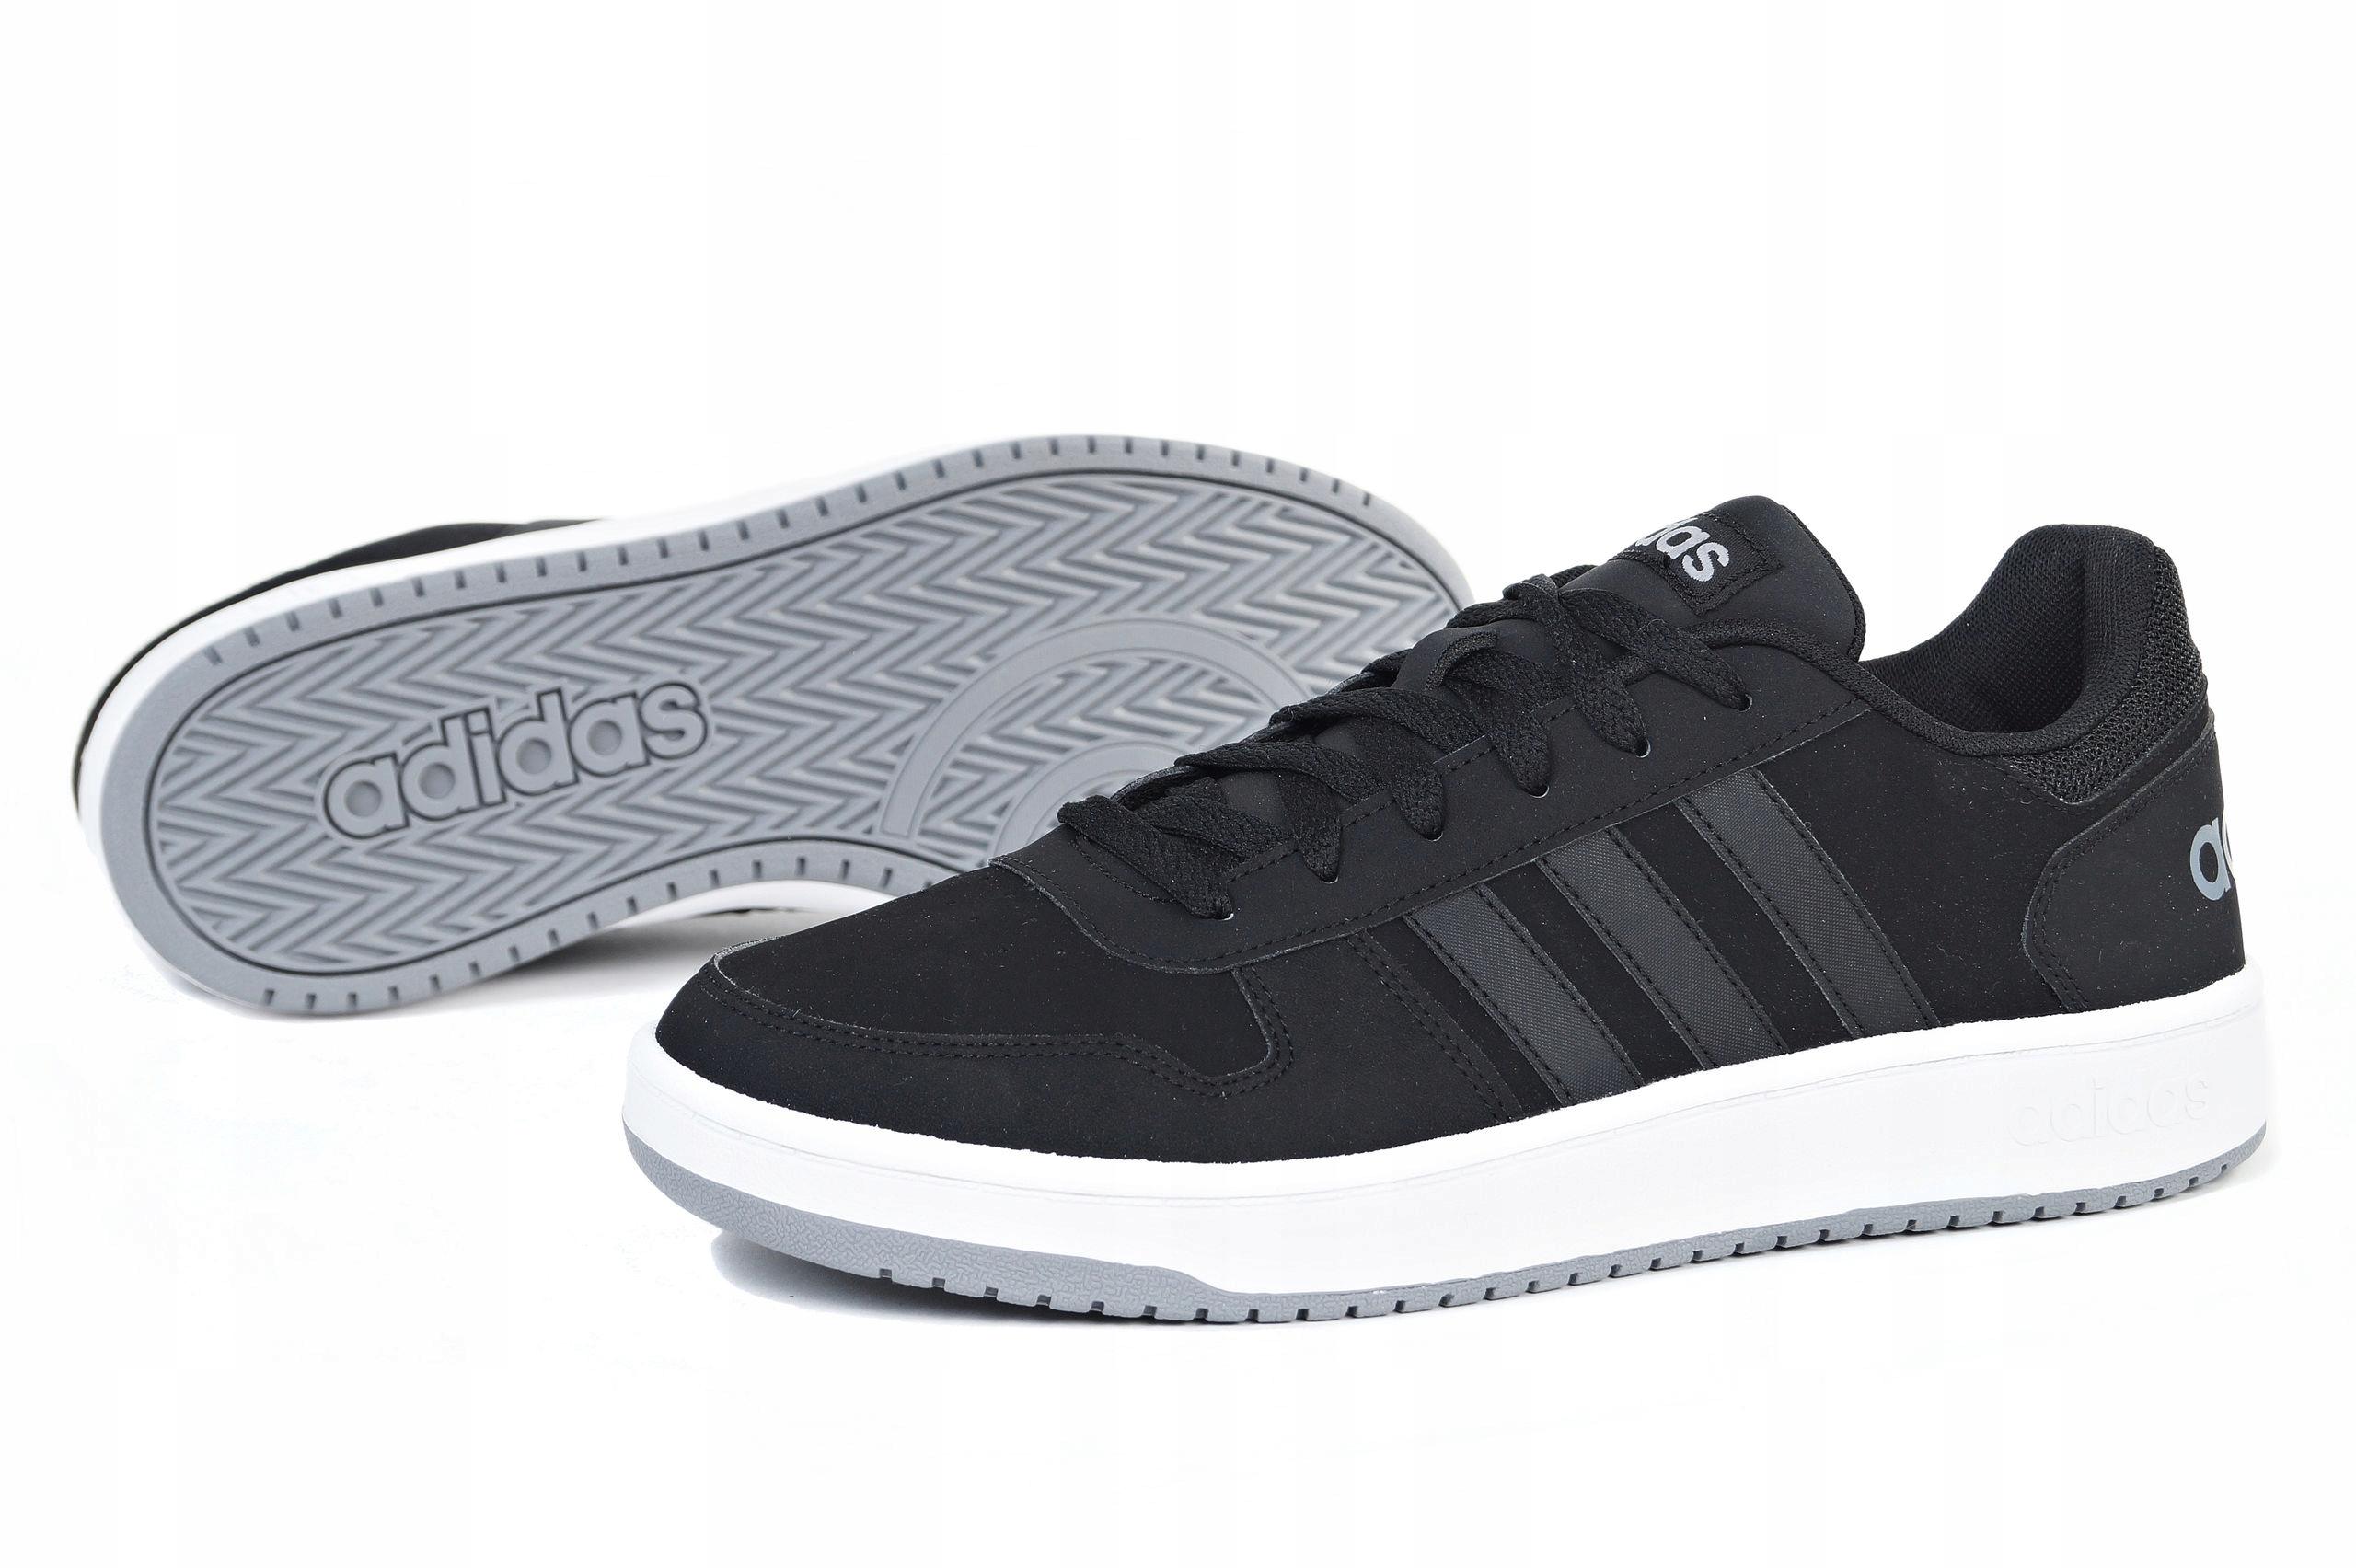 Buty Adidas Męskie Hoops 2.0 F34856 Granatowe Ceny i